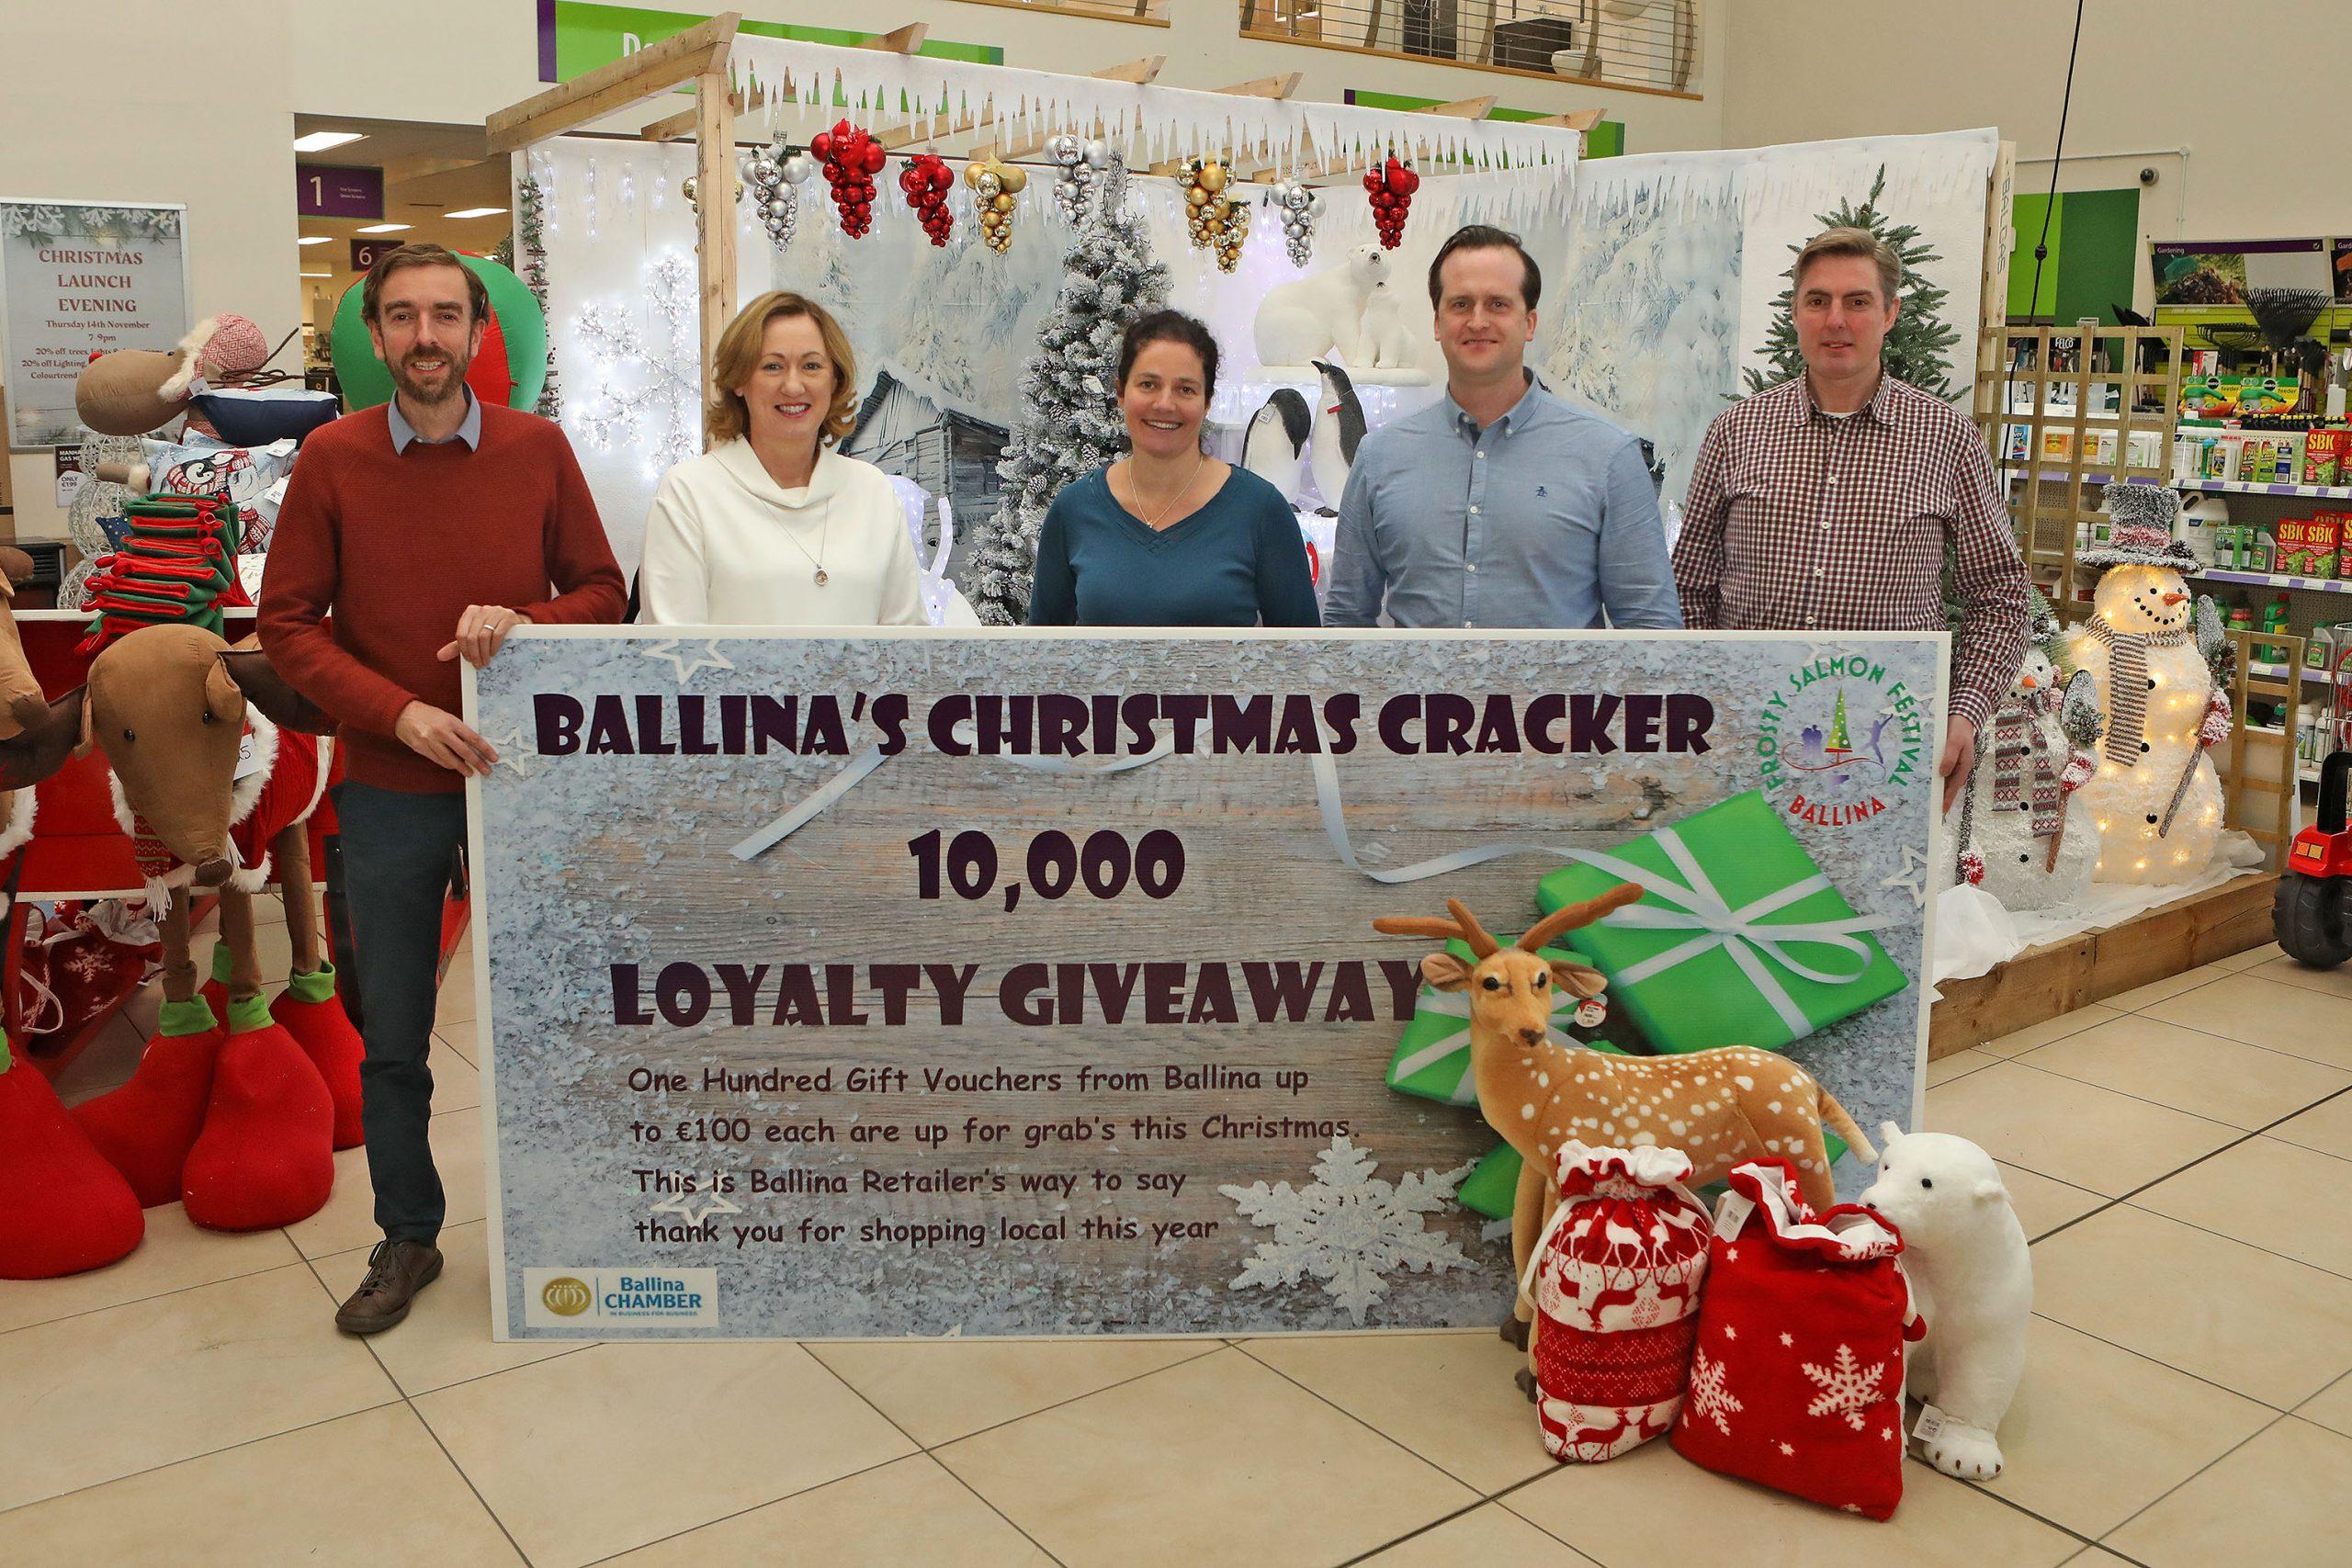 Ballina Chamber of commerce launching Christmas cracker bonanza